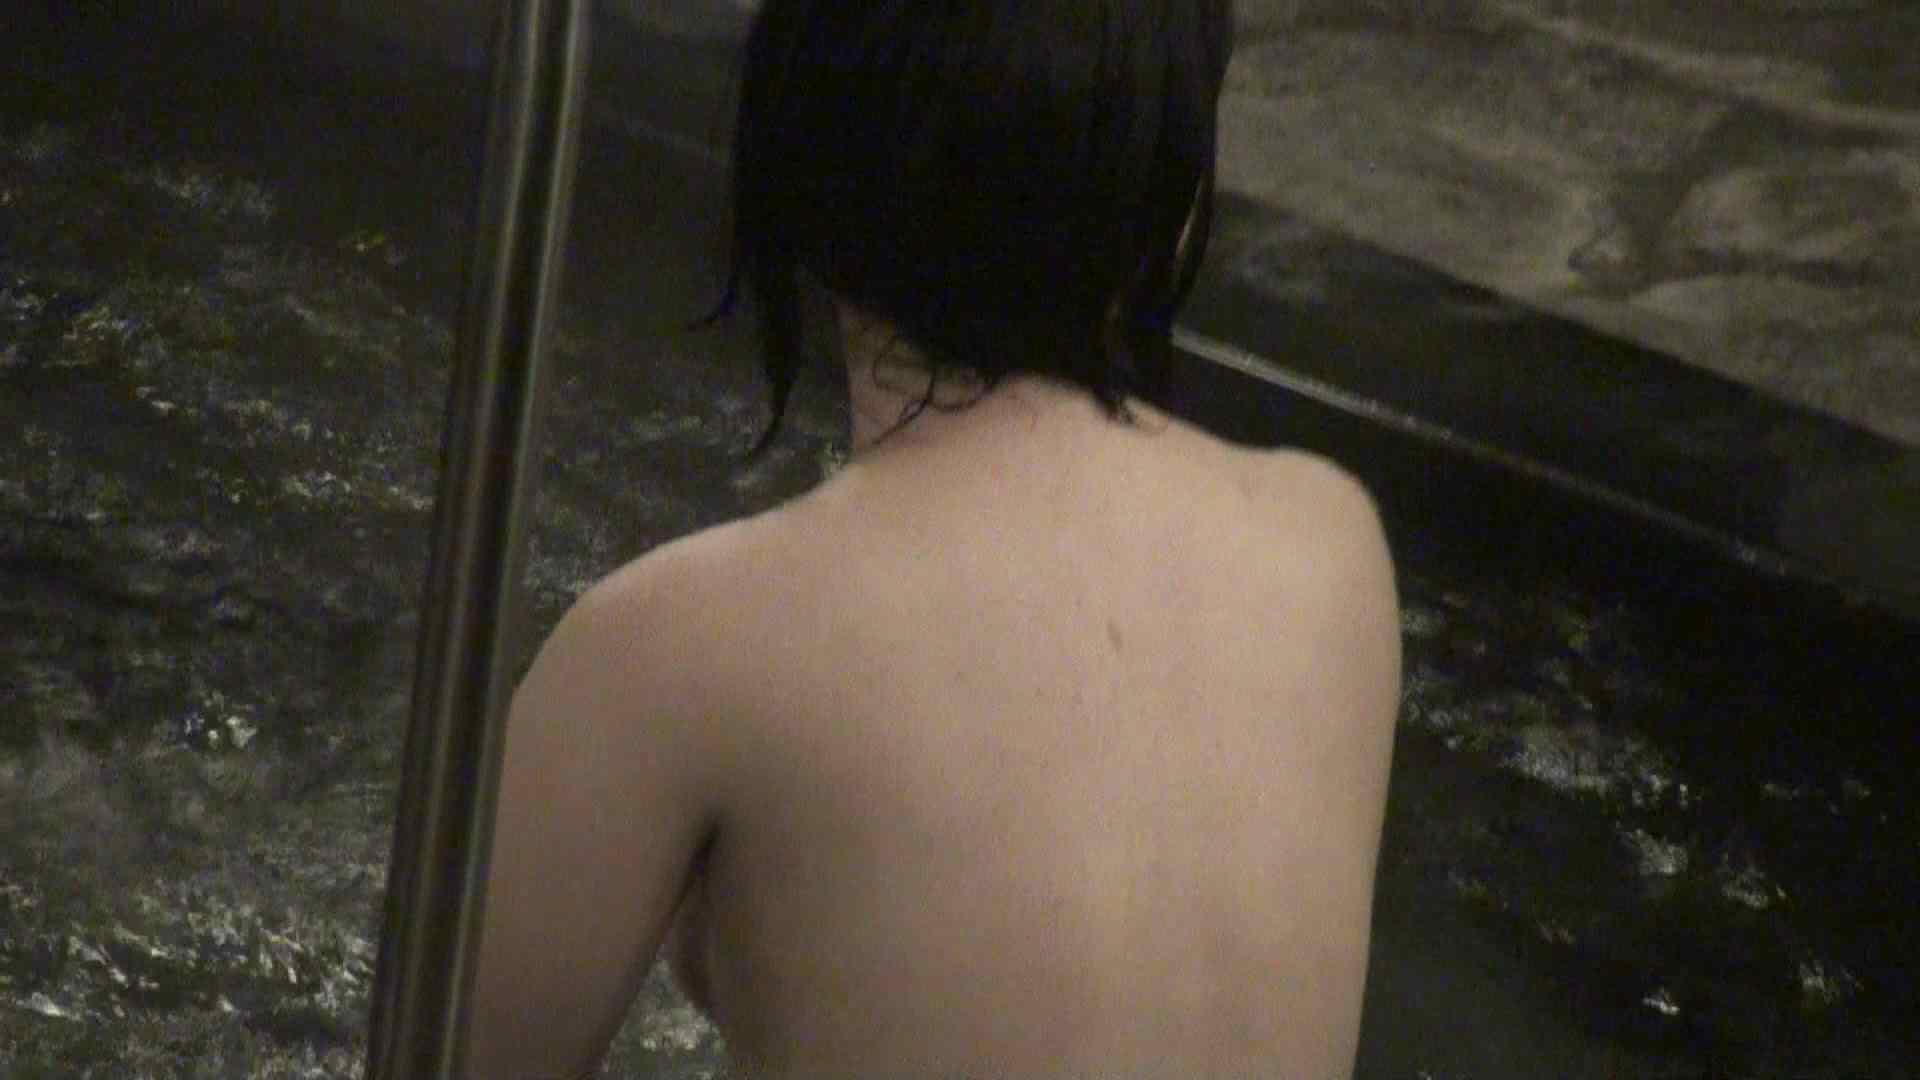 Aquaな露天風呂Vol.404 エッチな盗撮 盗み撮り動画 112pic 70